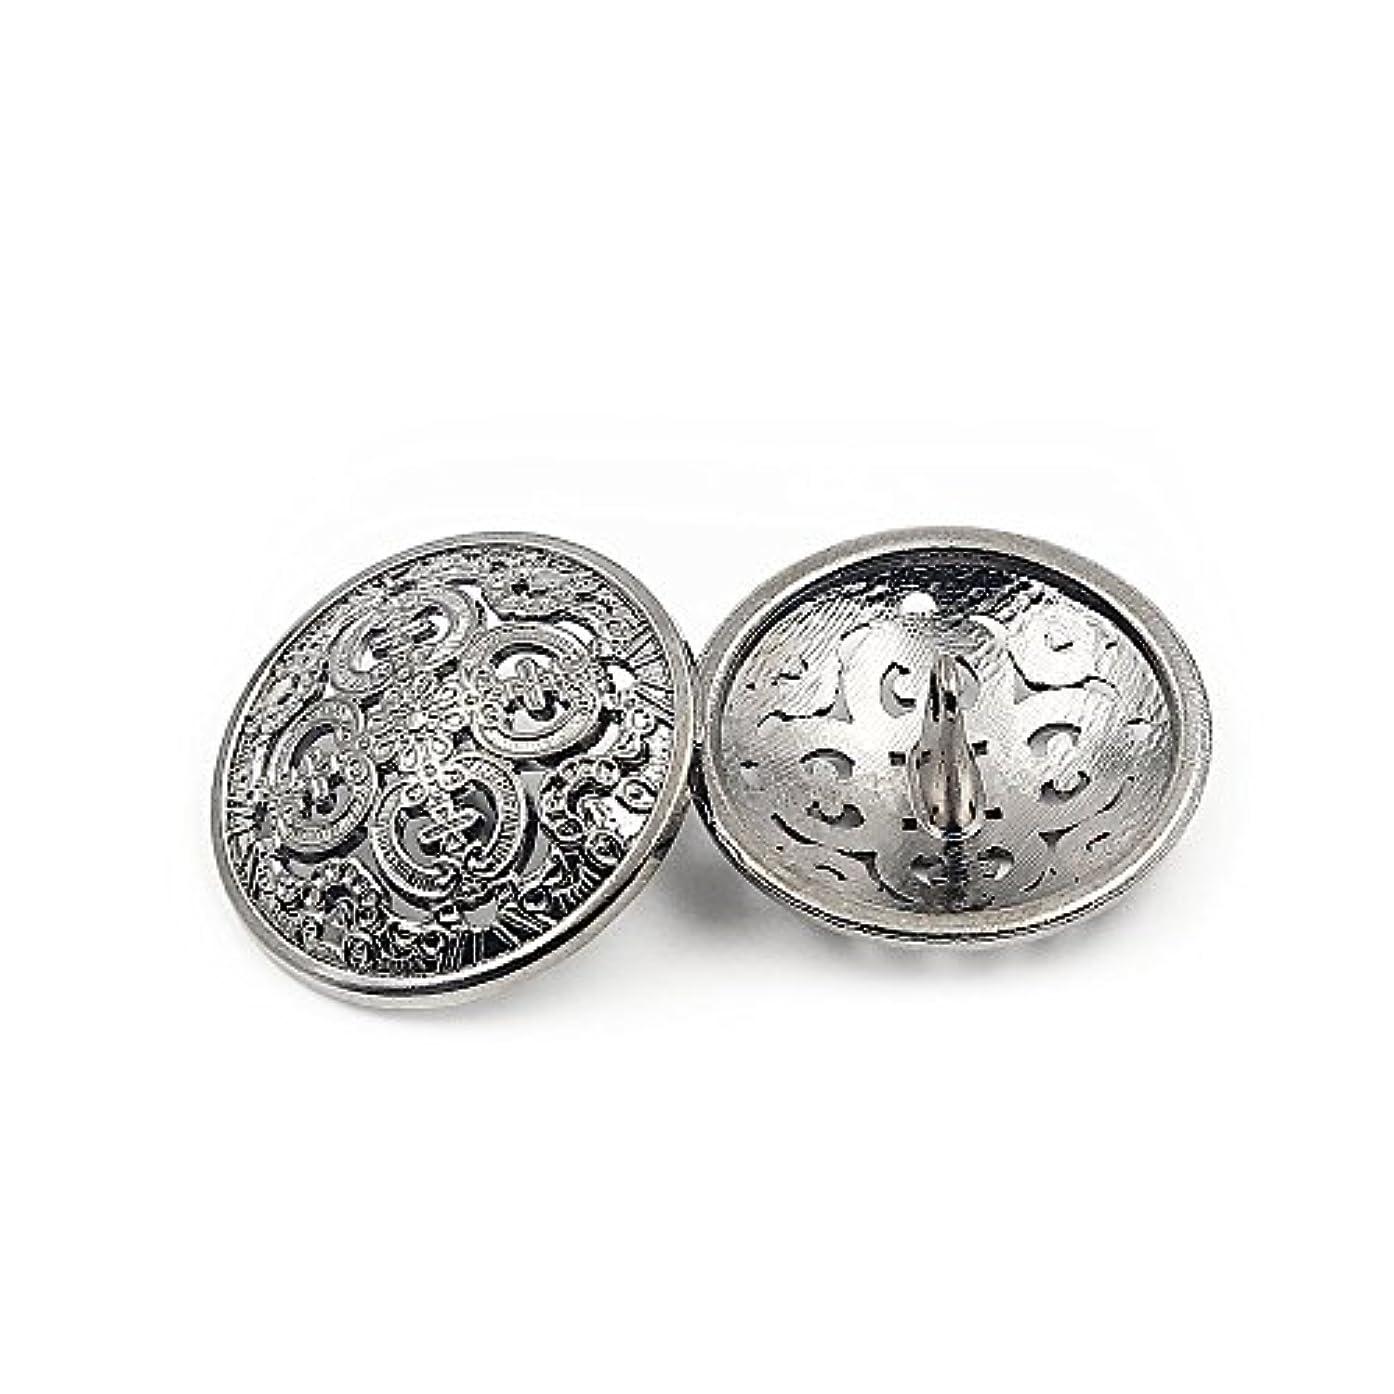 10PCS Clothes Button - Retro Hollow Sewing Button Shank Round Shaped Metal Button Set for Men Women Blazer, Coat, Uniform, Shirt, Suit and Jacket (Silver, 20mm)